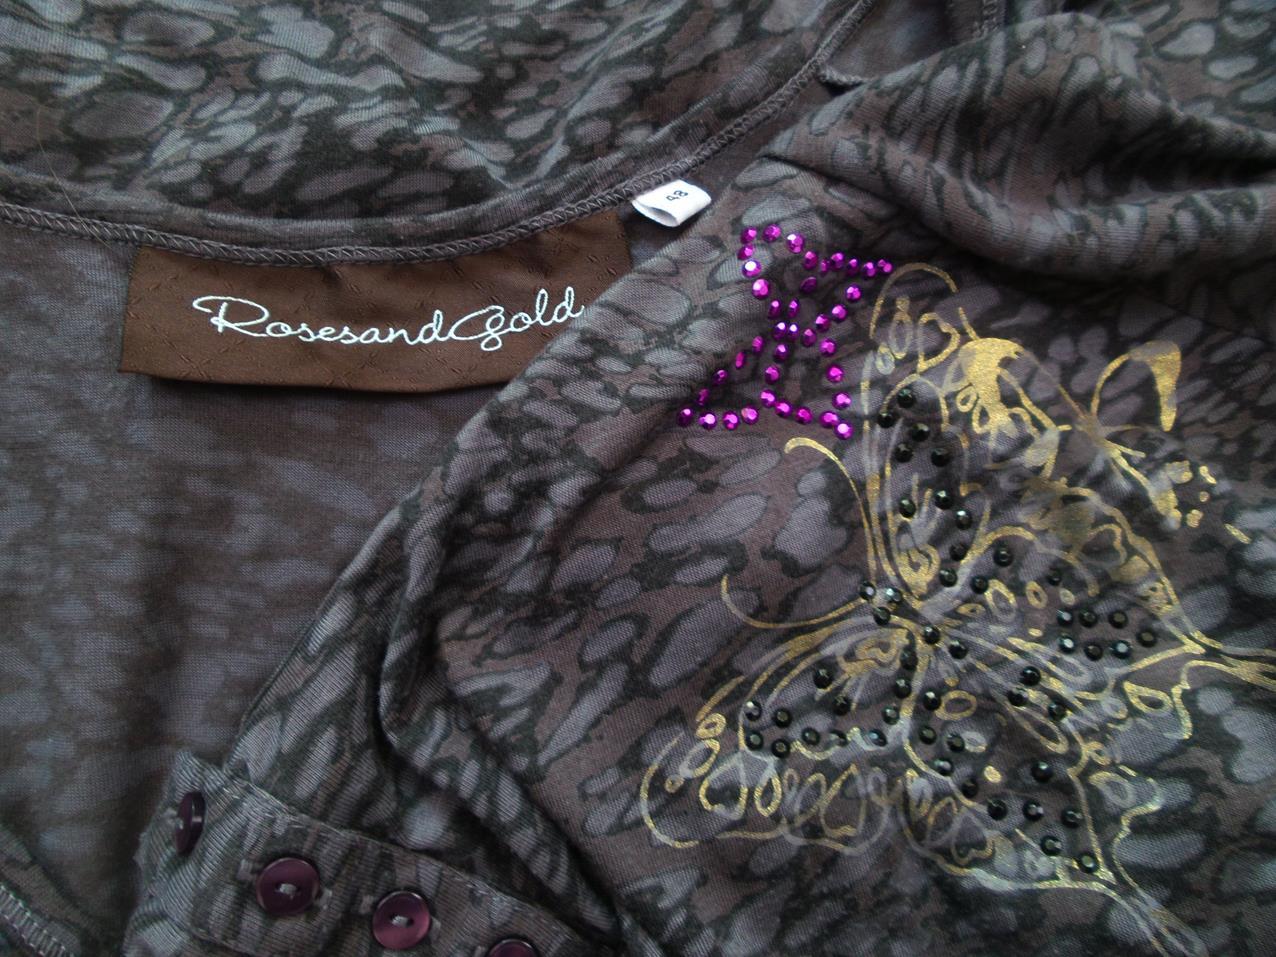 11ab36fb672a Rosesand str 48 guld tunika / kjole rhinestones   RomanticFashion.se